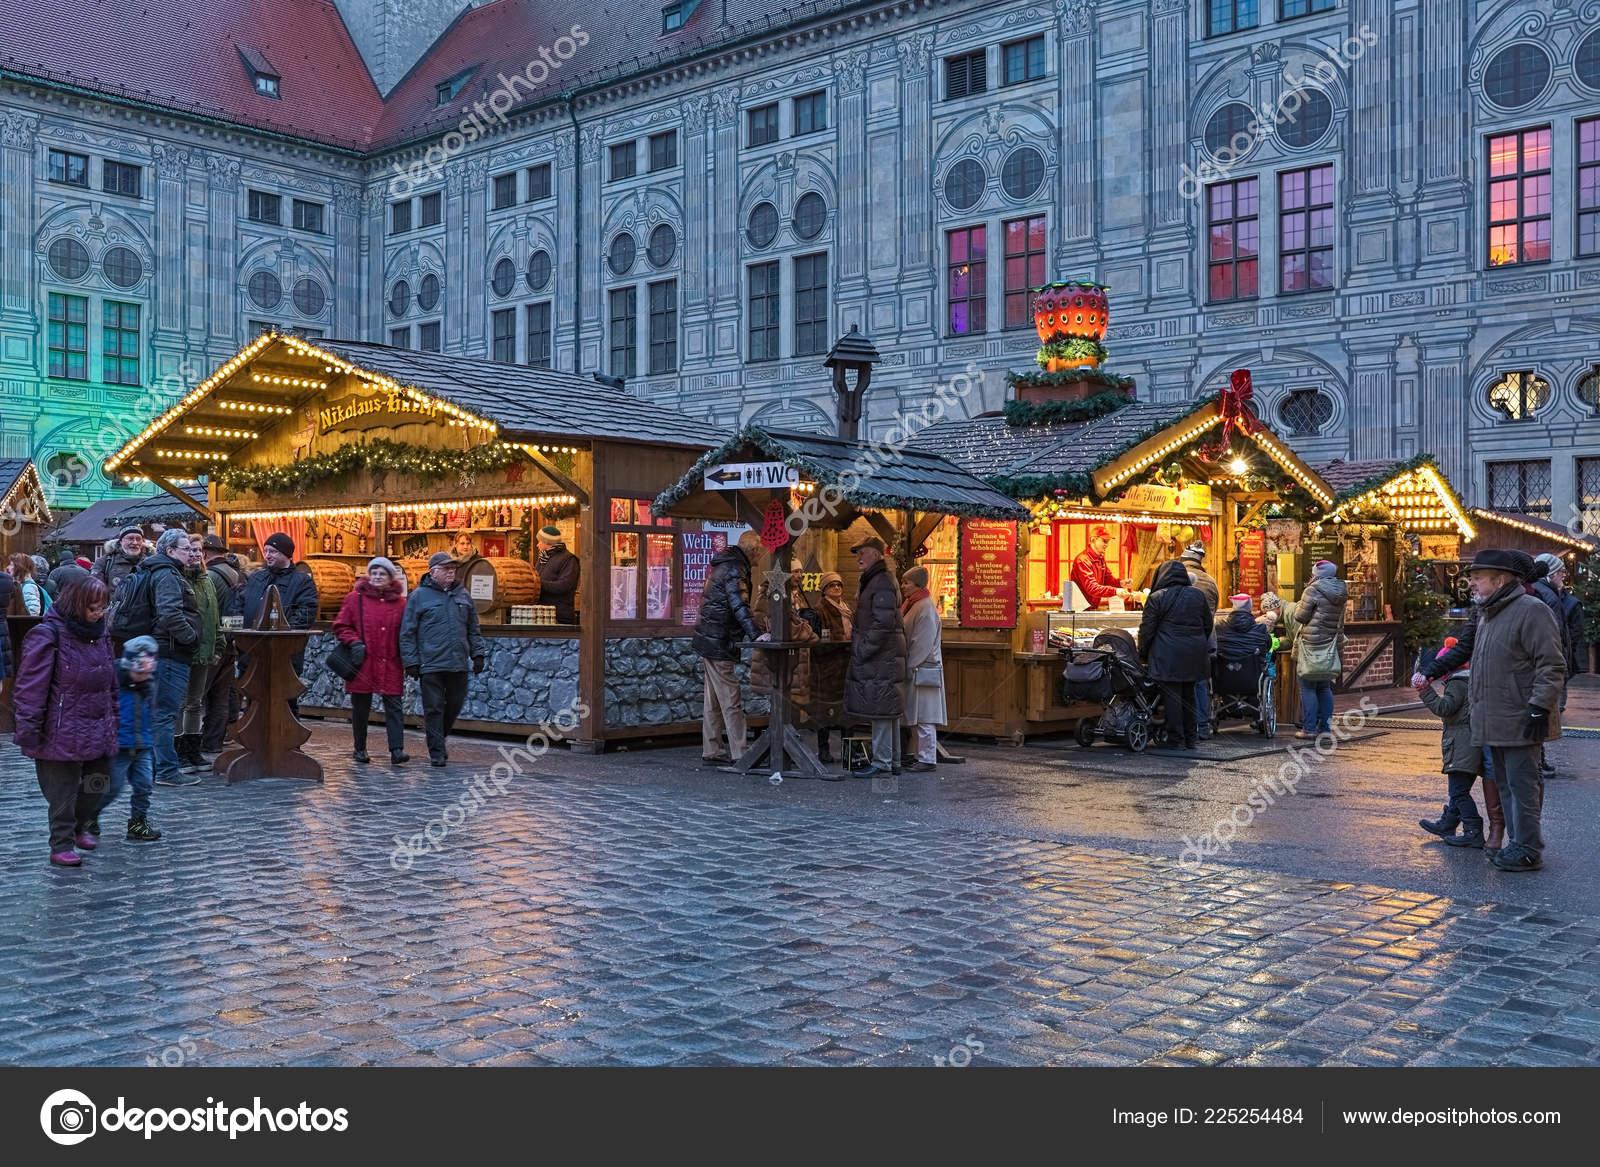 Munich Germany Christmas.Munich Germany December 2017 Christmas Village Emperor Court